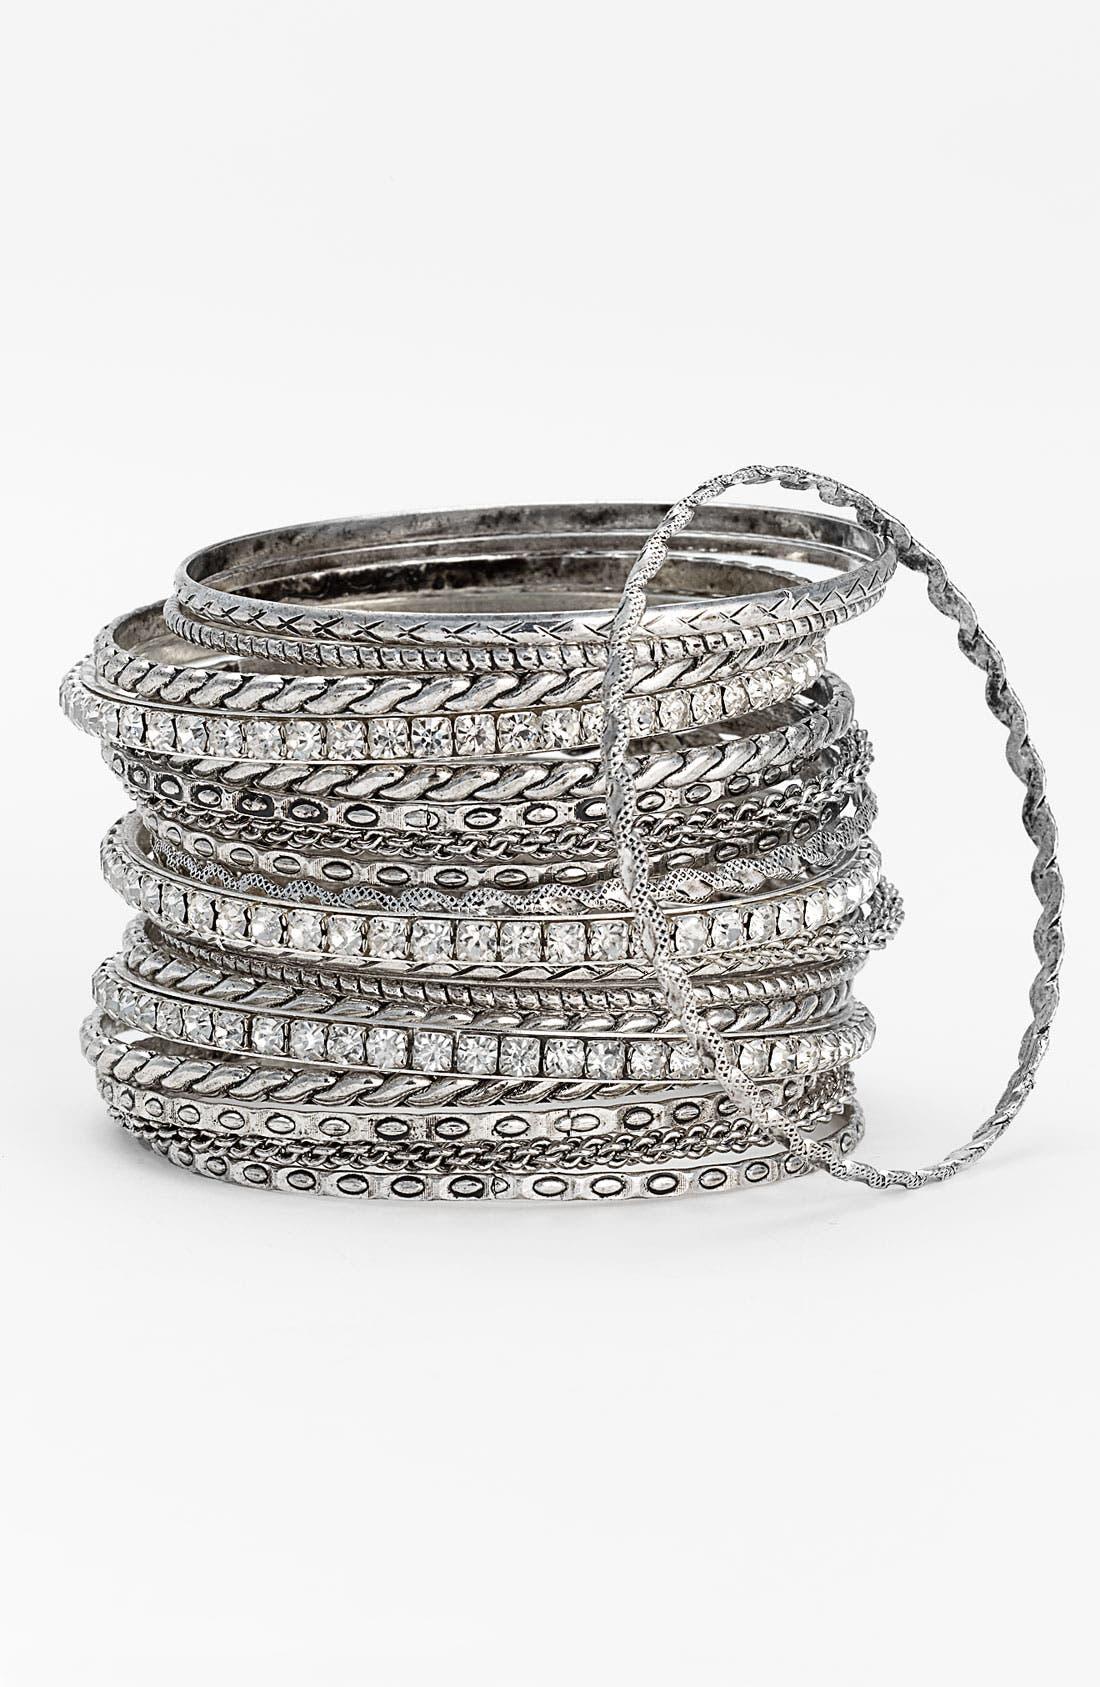 Alternate Image 1 Selected - Cara Accessories Metal & Crystal Bangles (Set of 24)